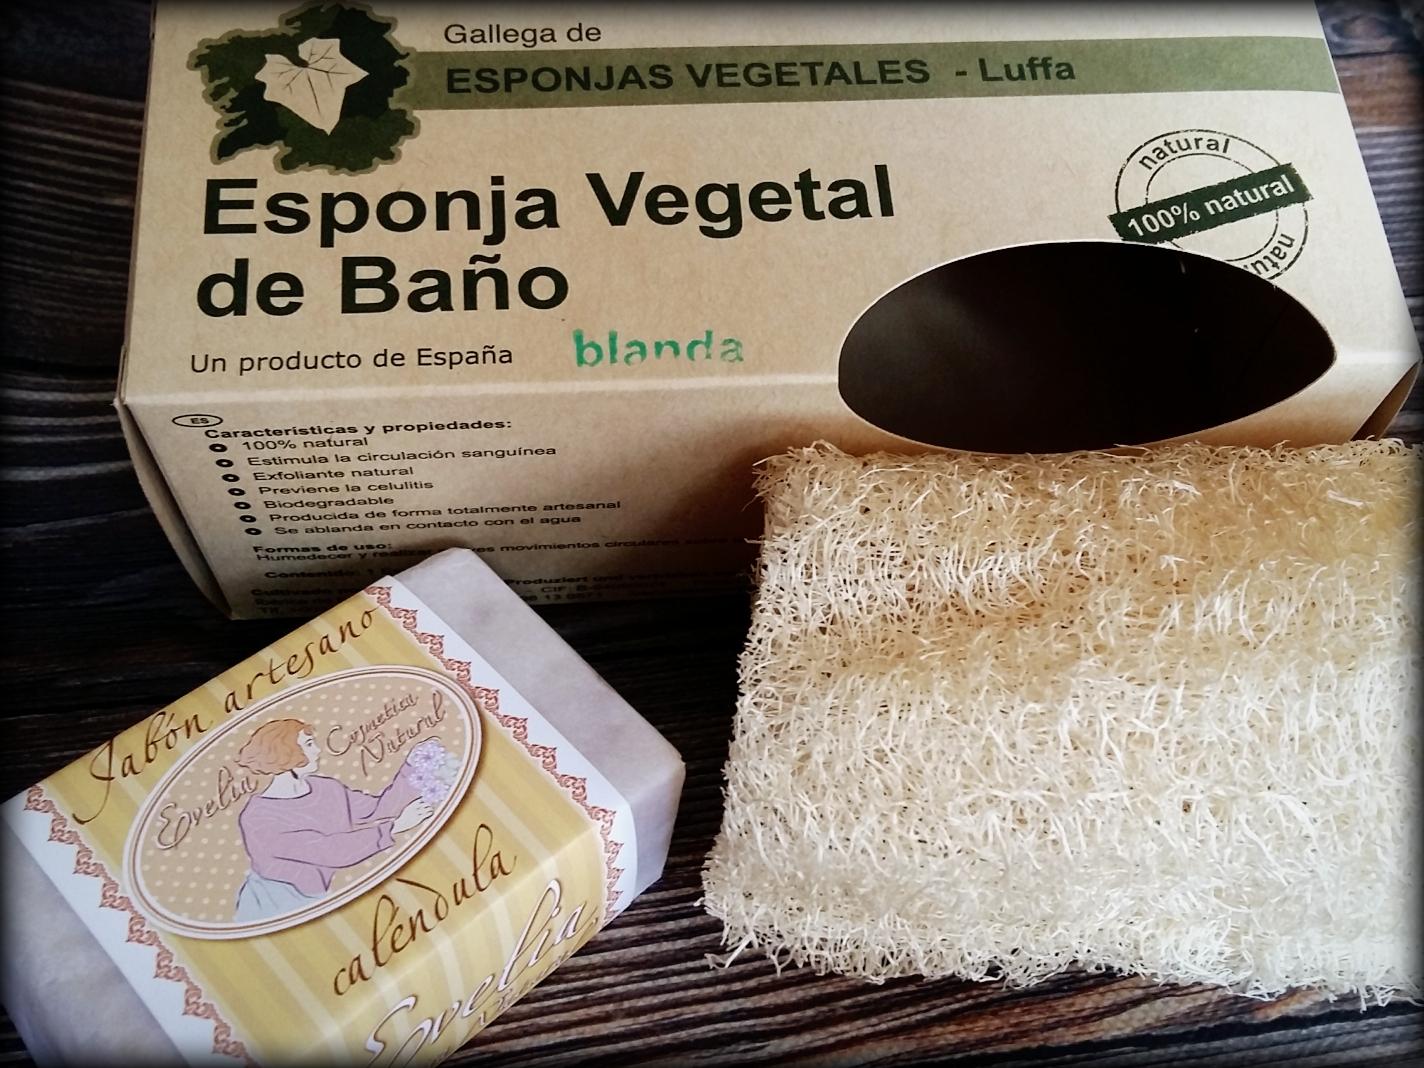 Alonso de la torre cosm tica natural nuevos productos - Esponja natural vegetal ...